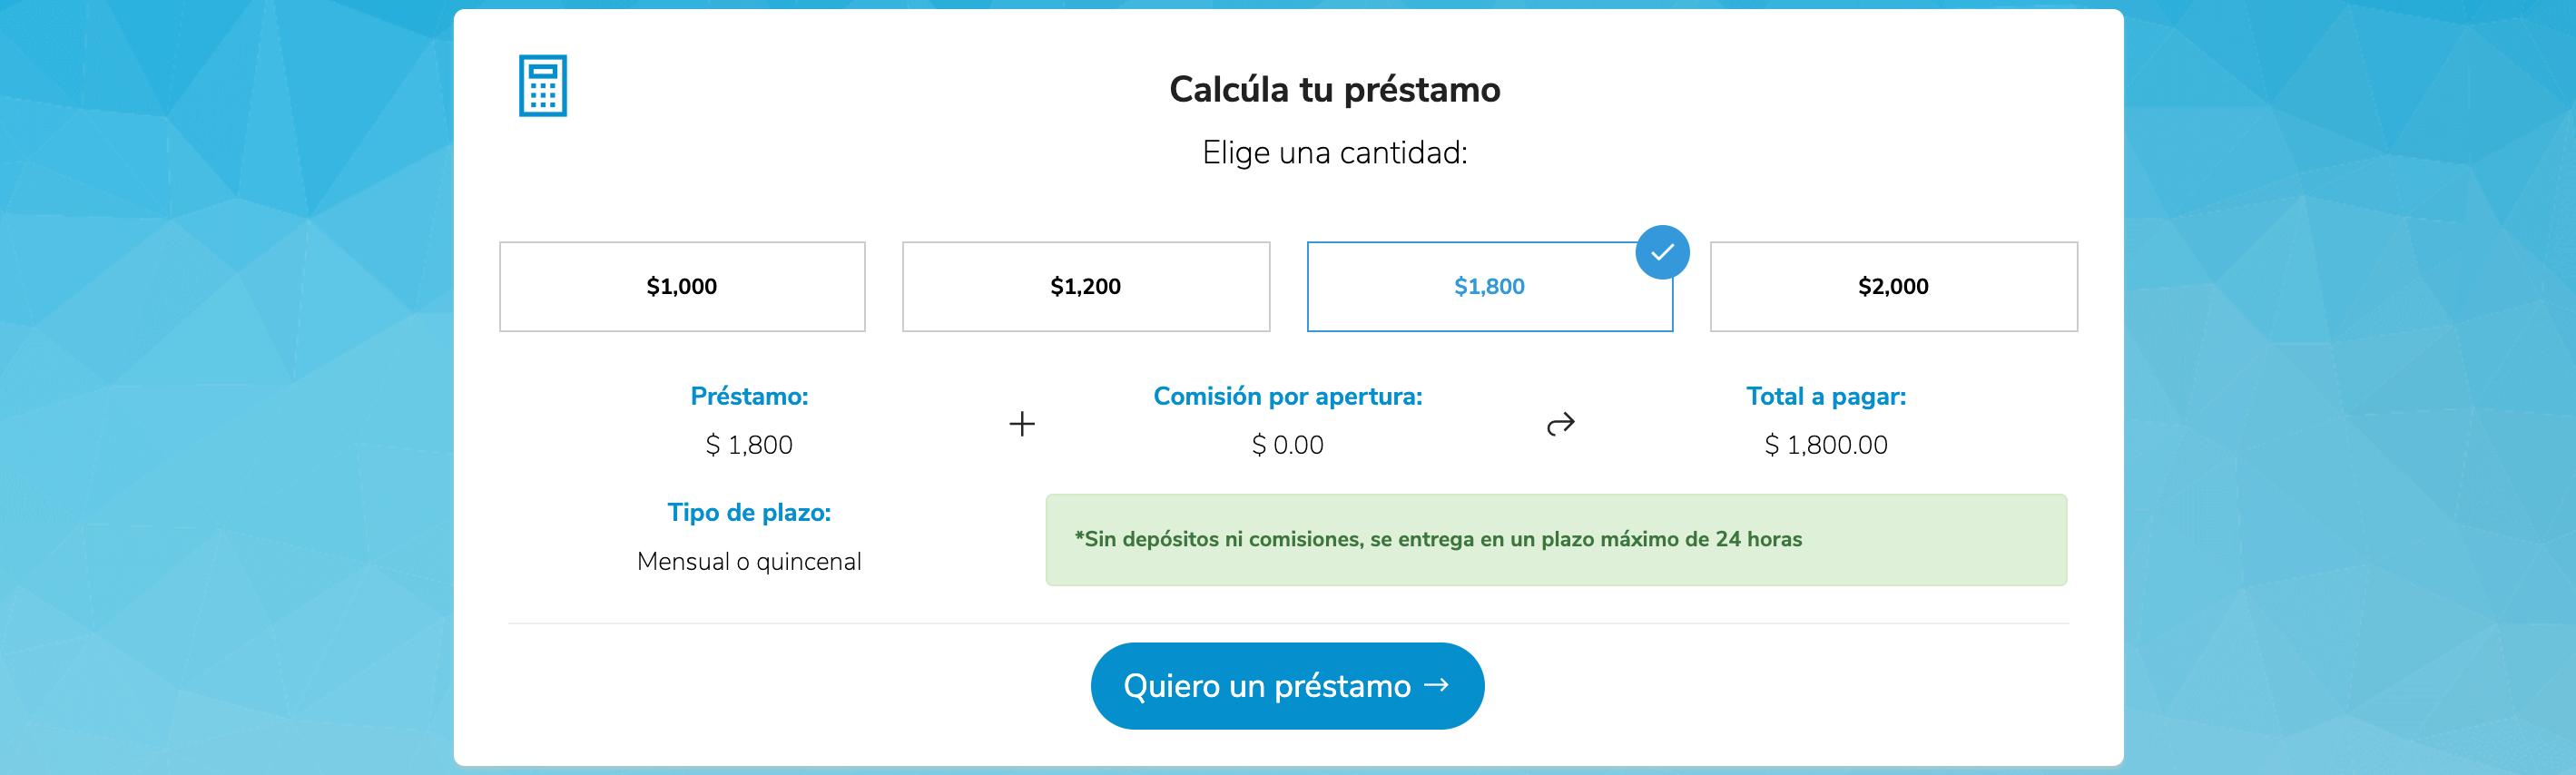 CrediClic primer préstamo de hasta 2000 pesos sin intereses!